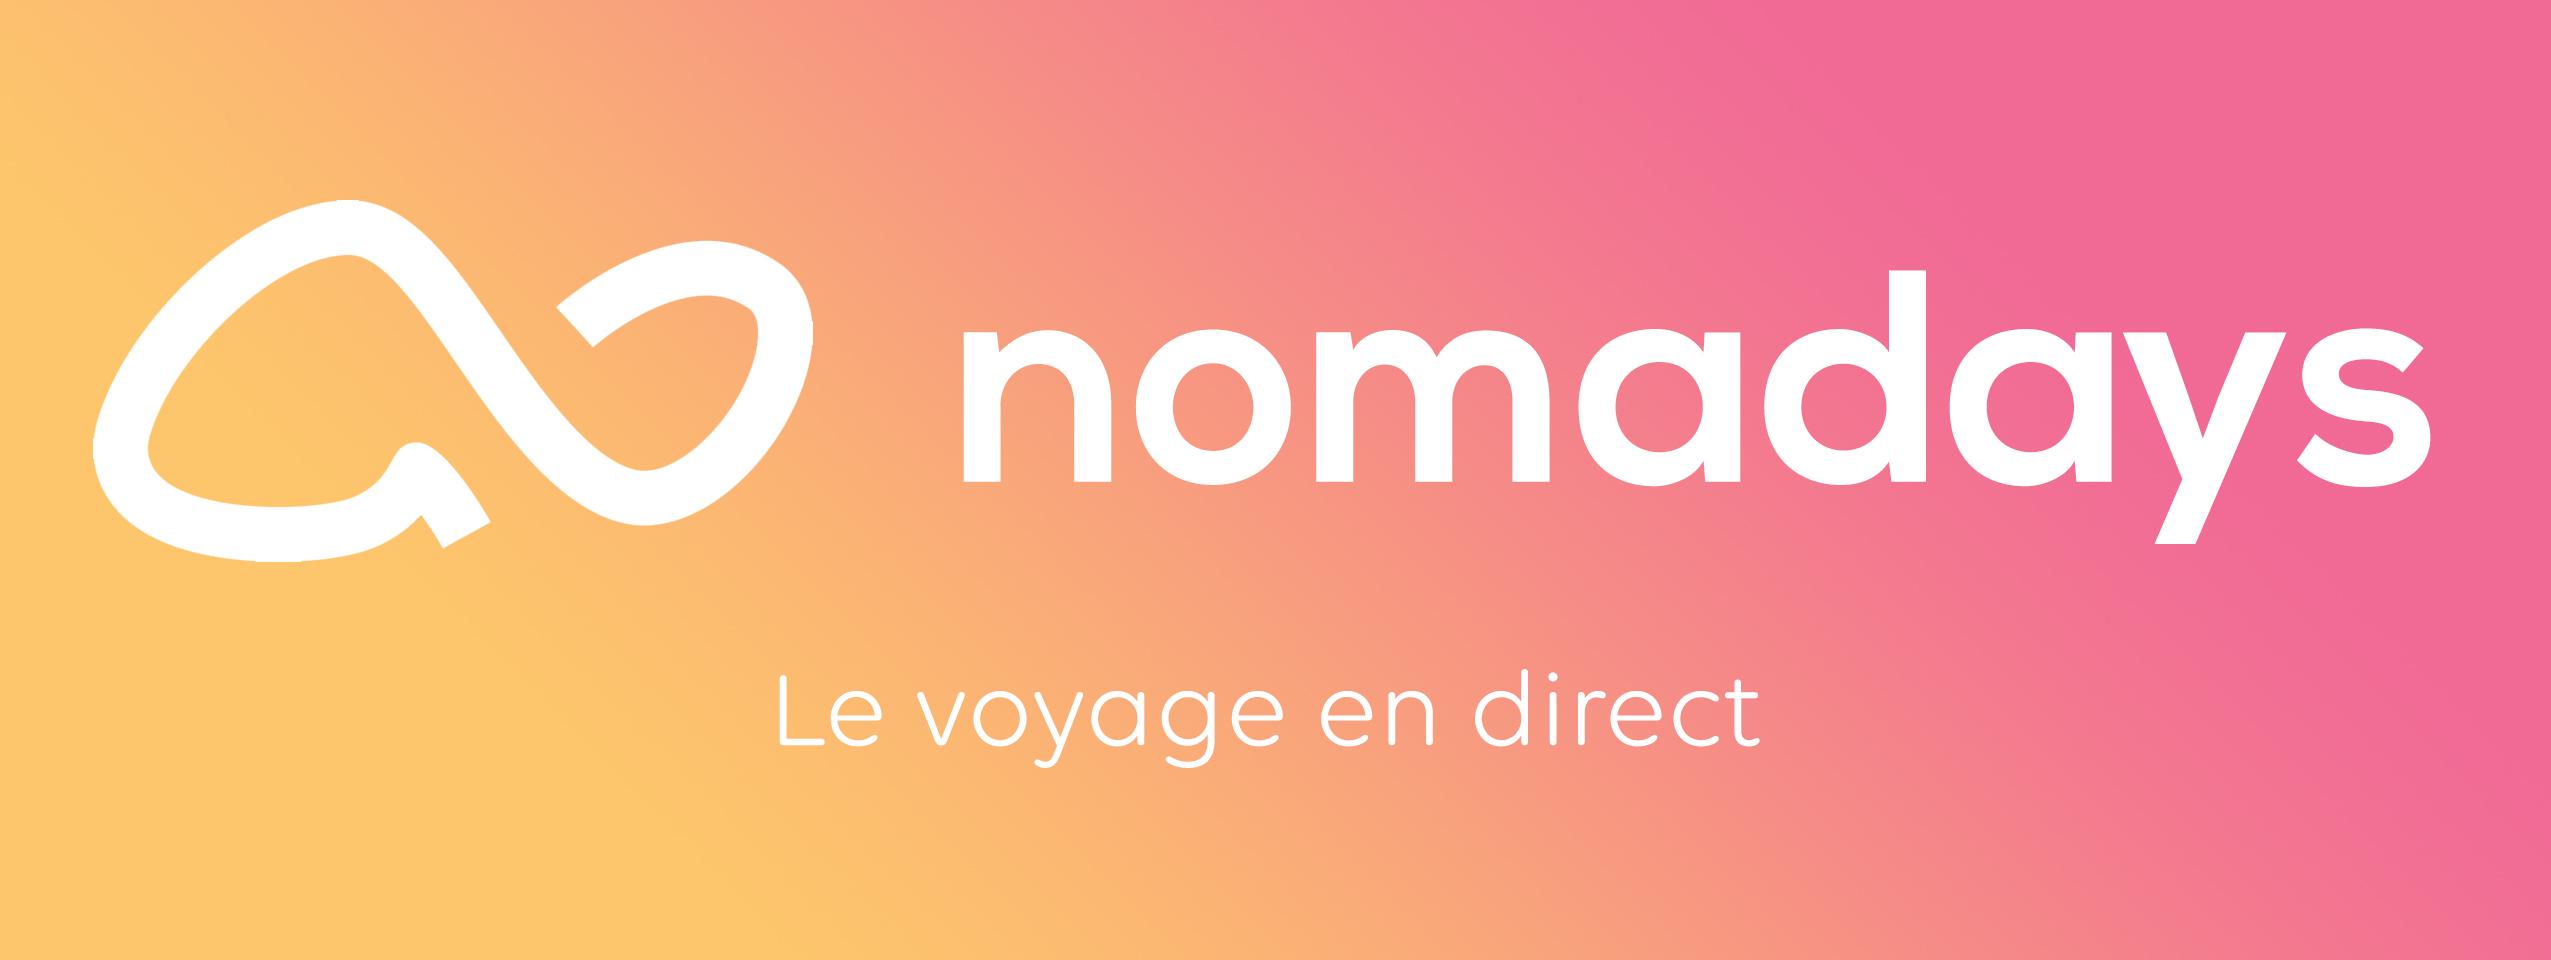 Nomadays